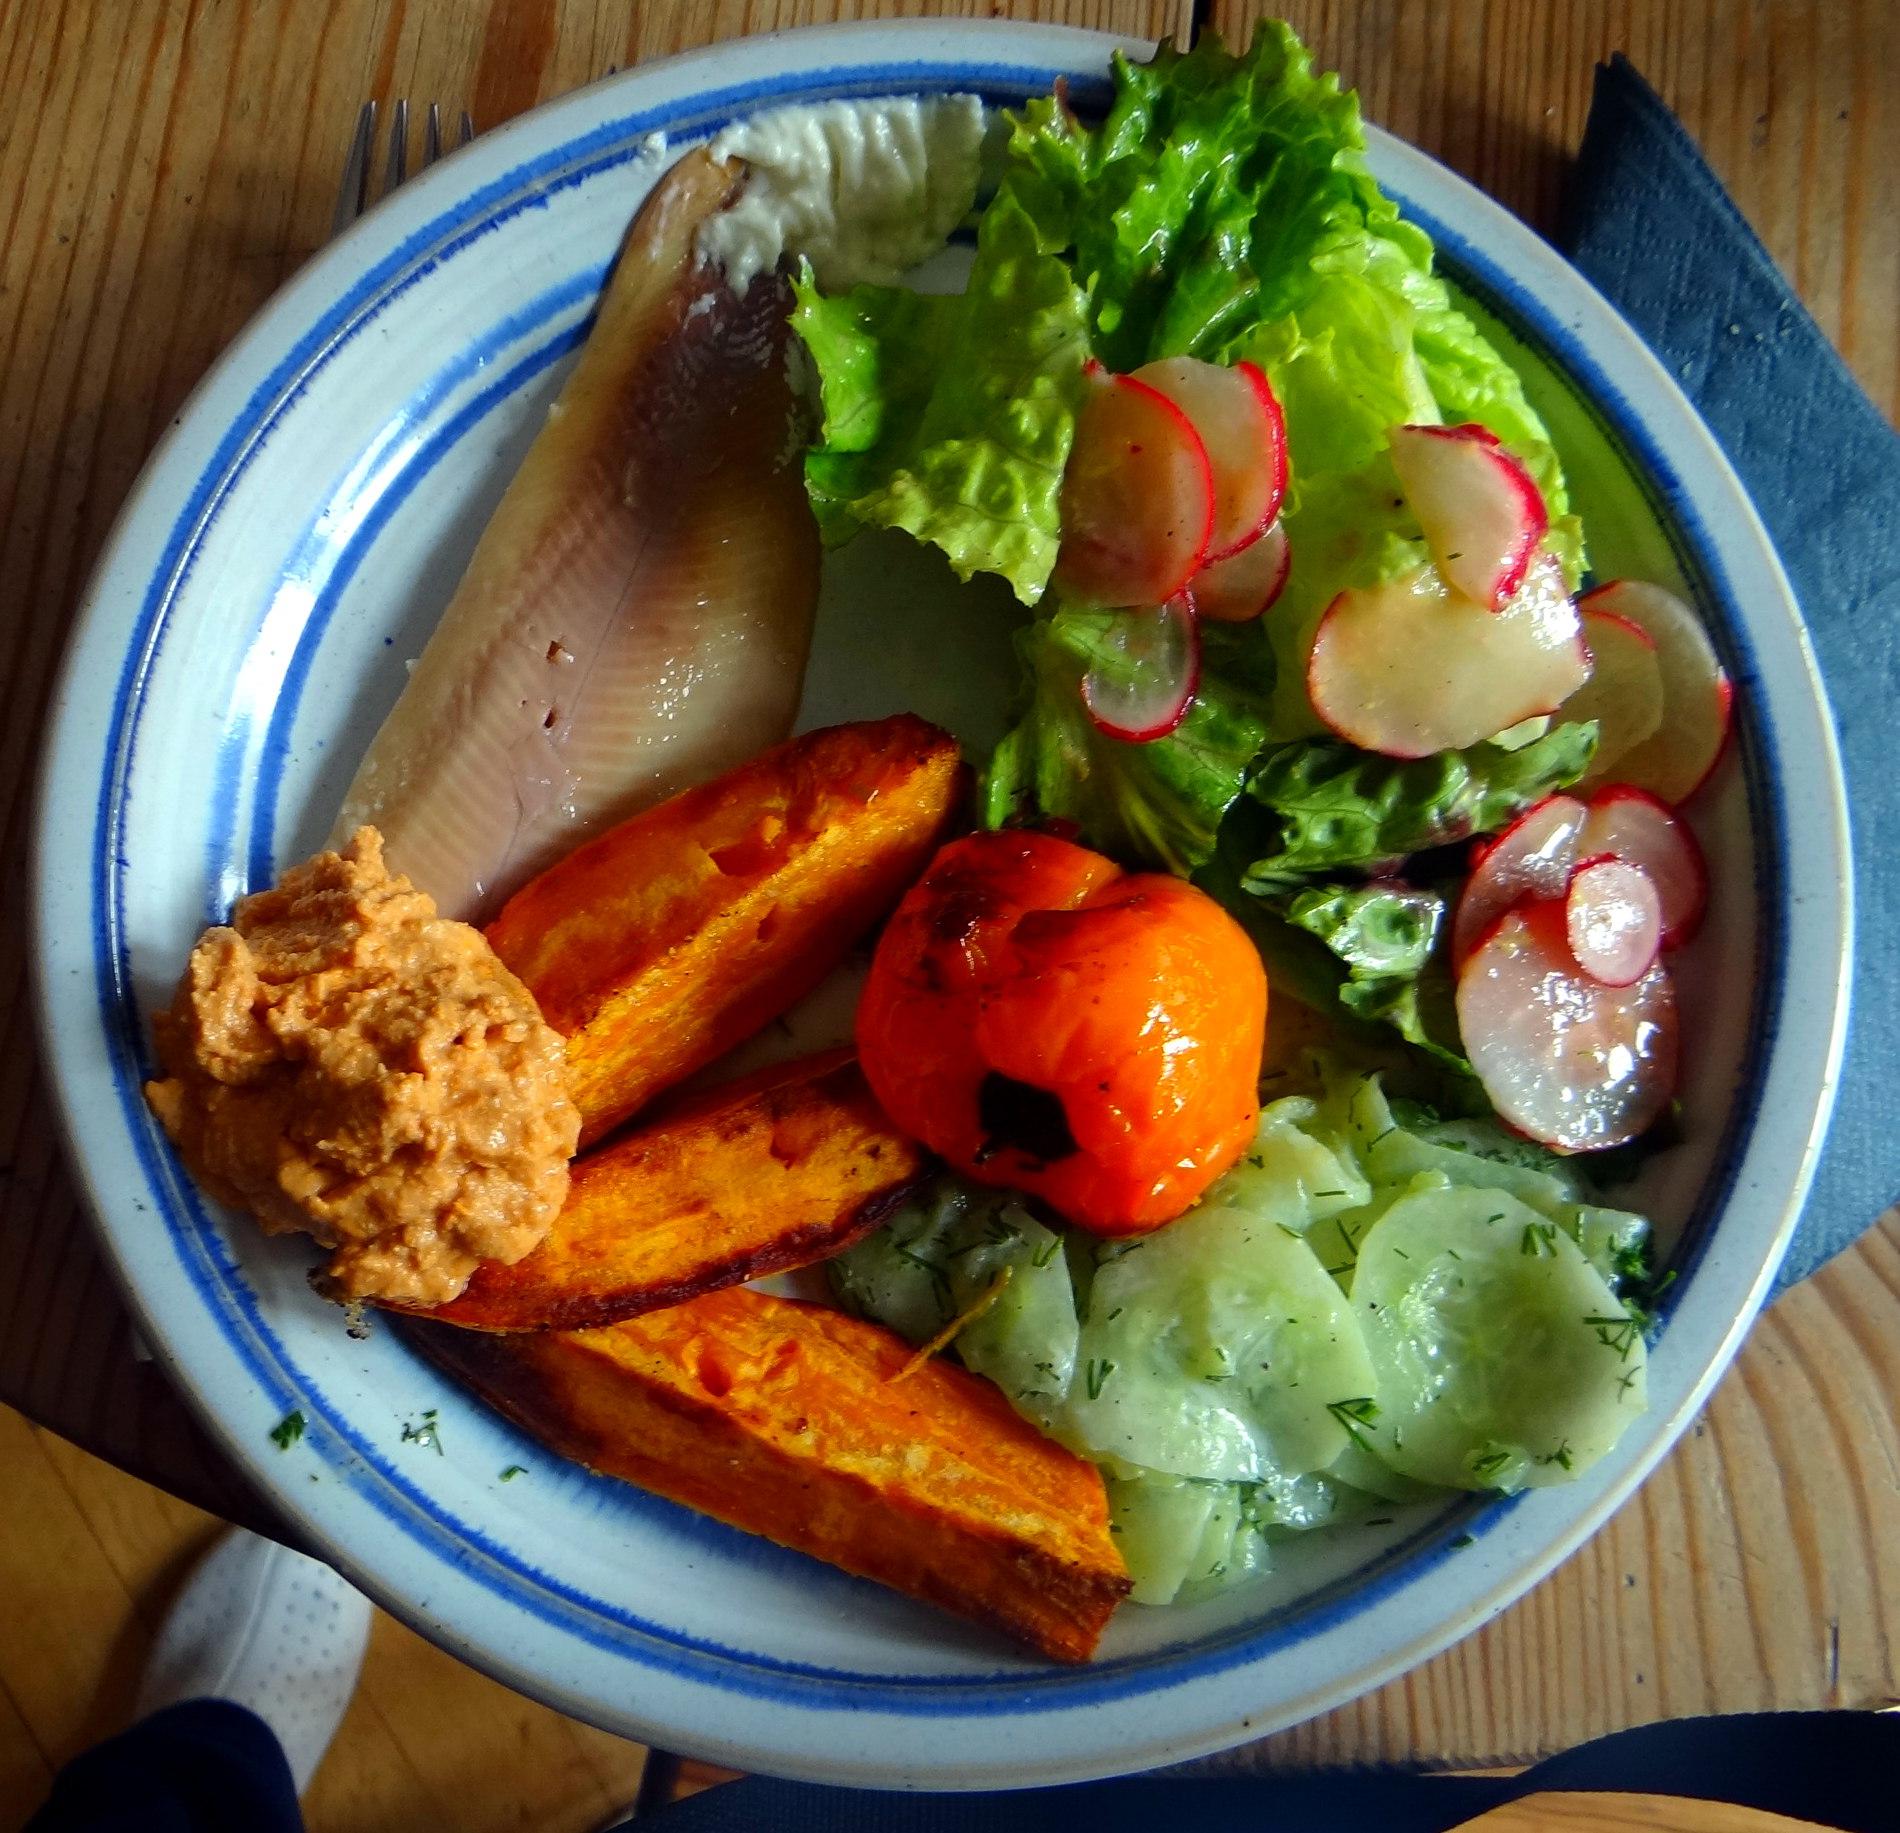 Süßkartoffel Spalten,Feta Creme,Salate (1)